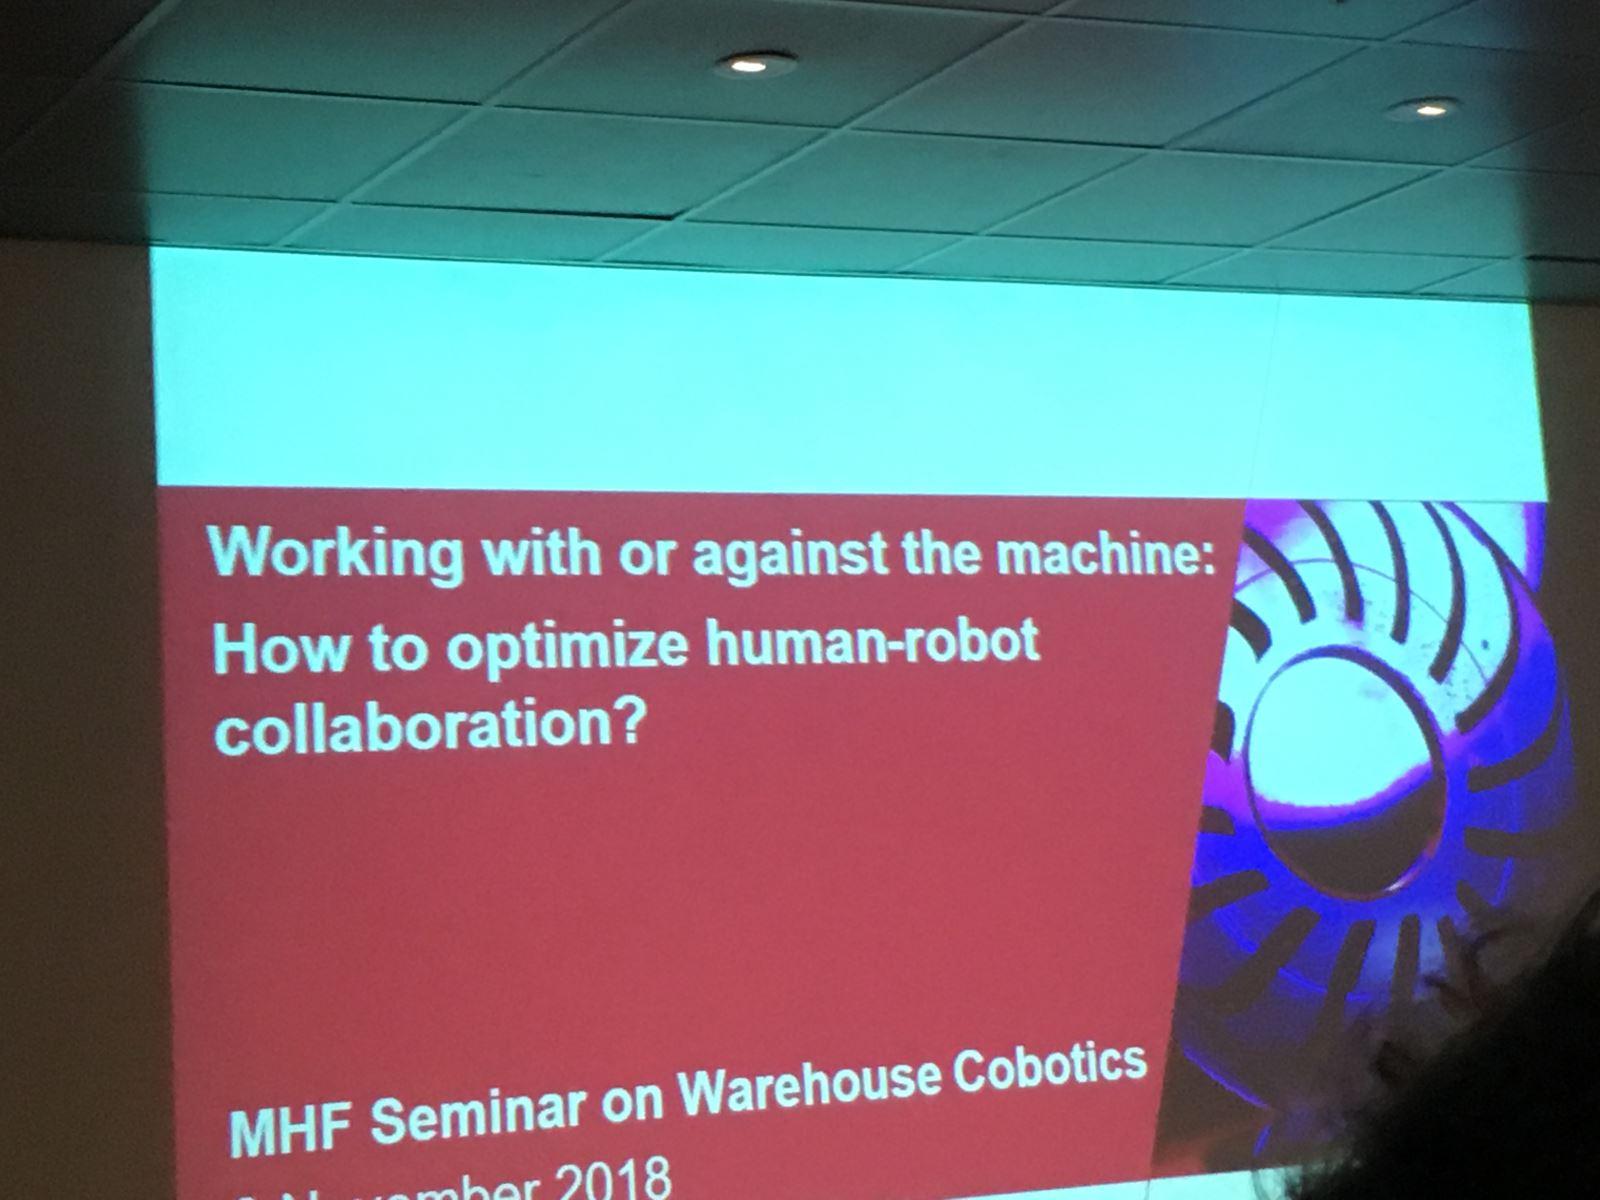 seminar warehouse robotics 8 november